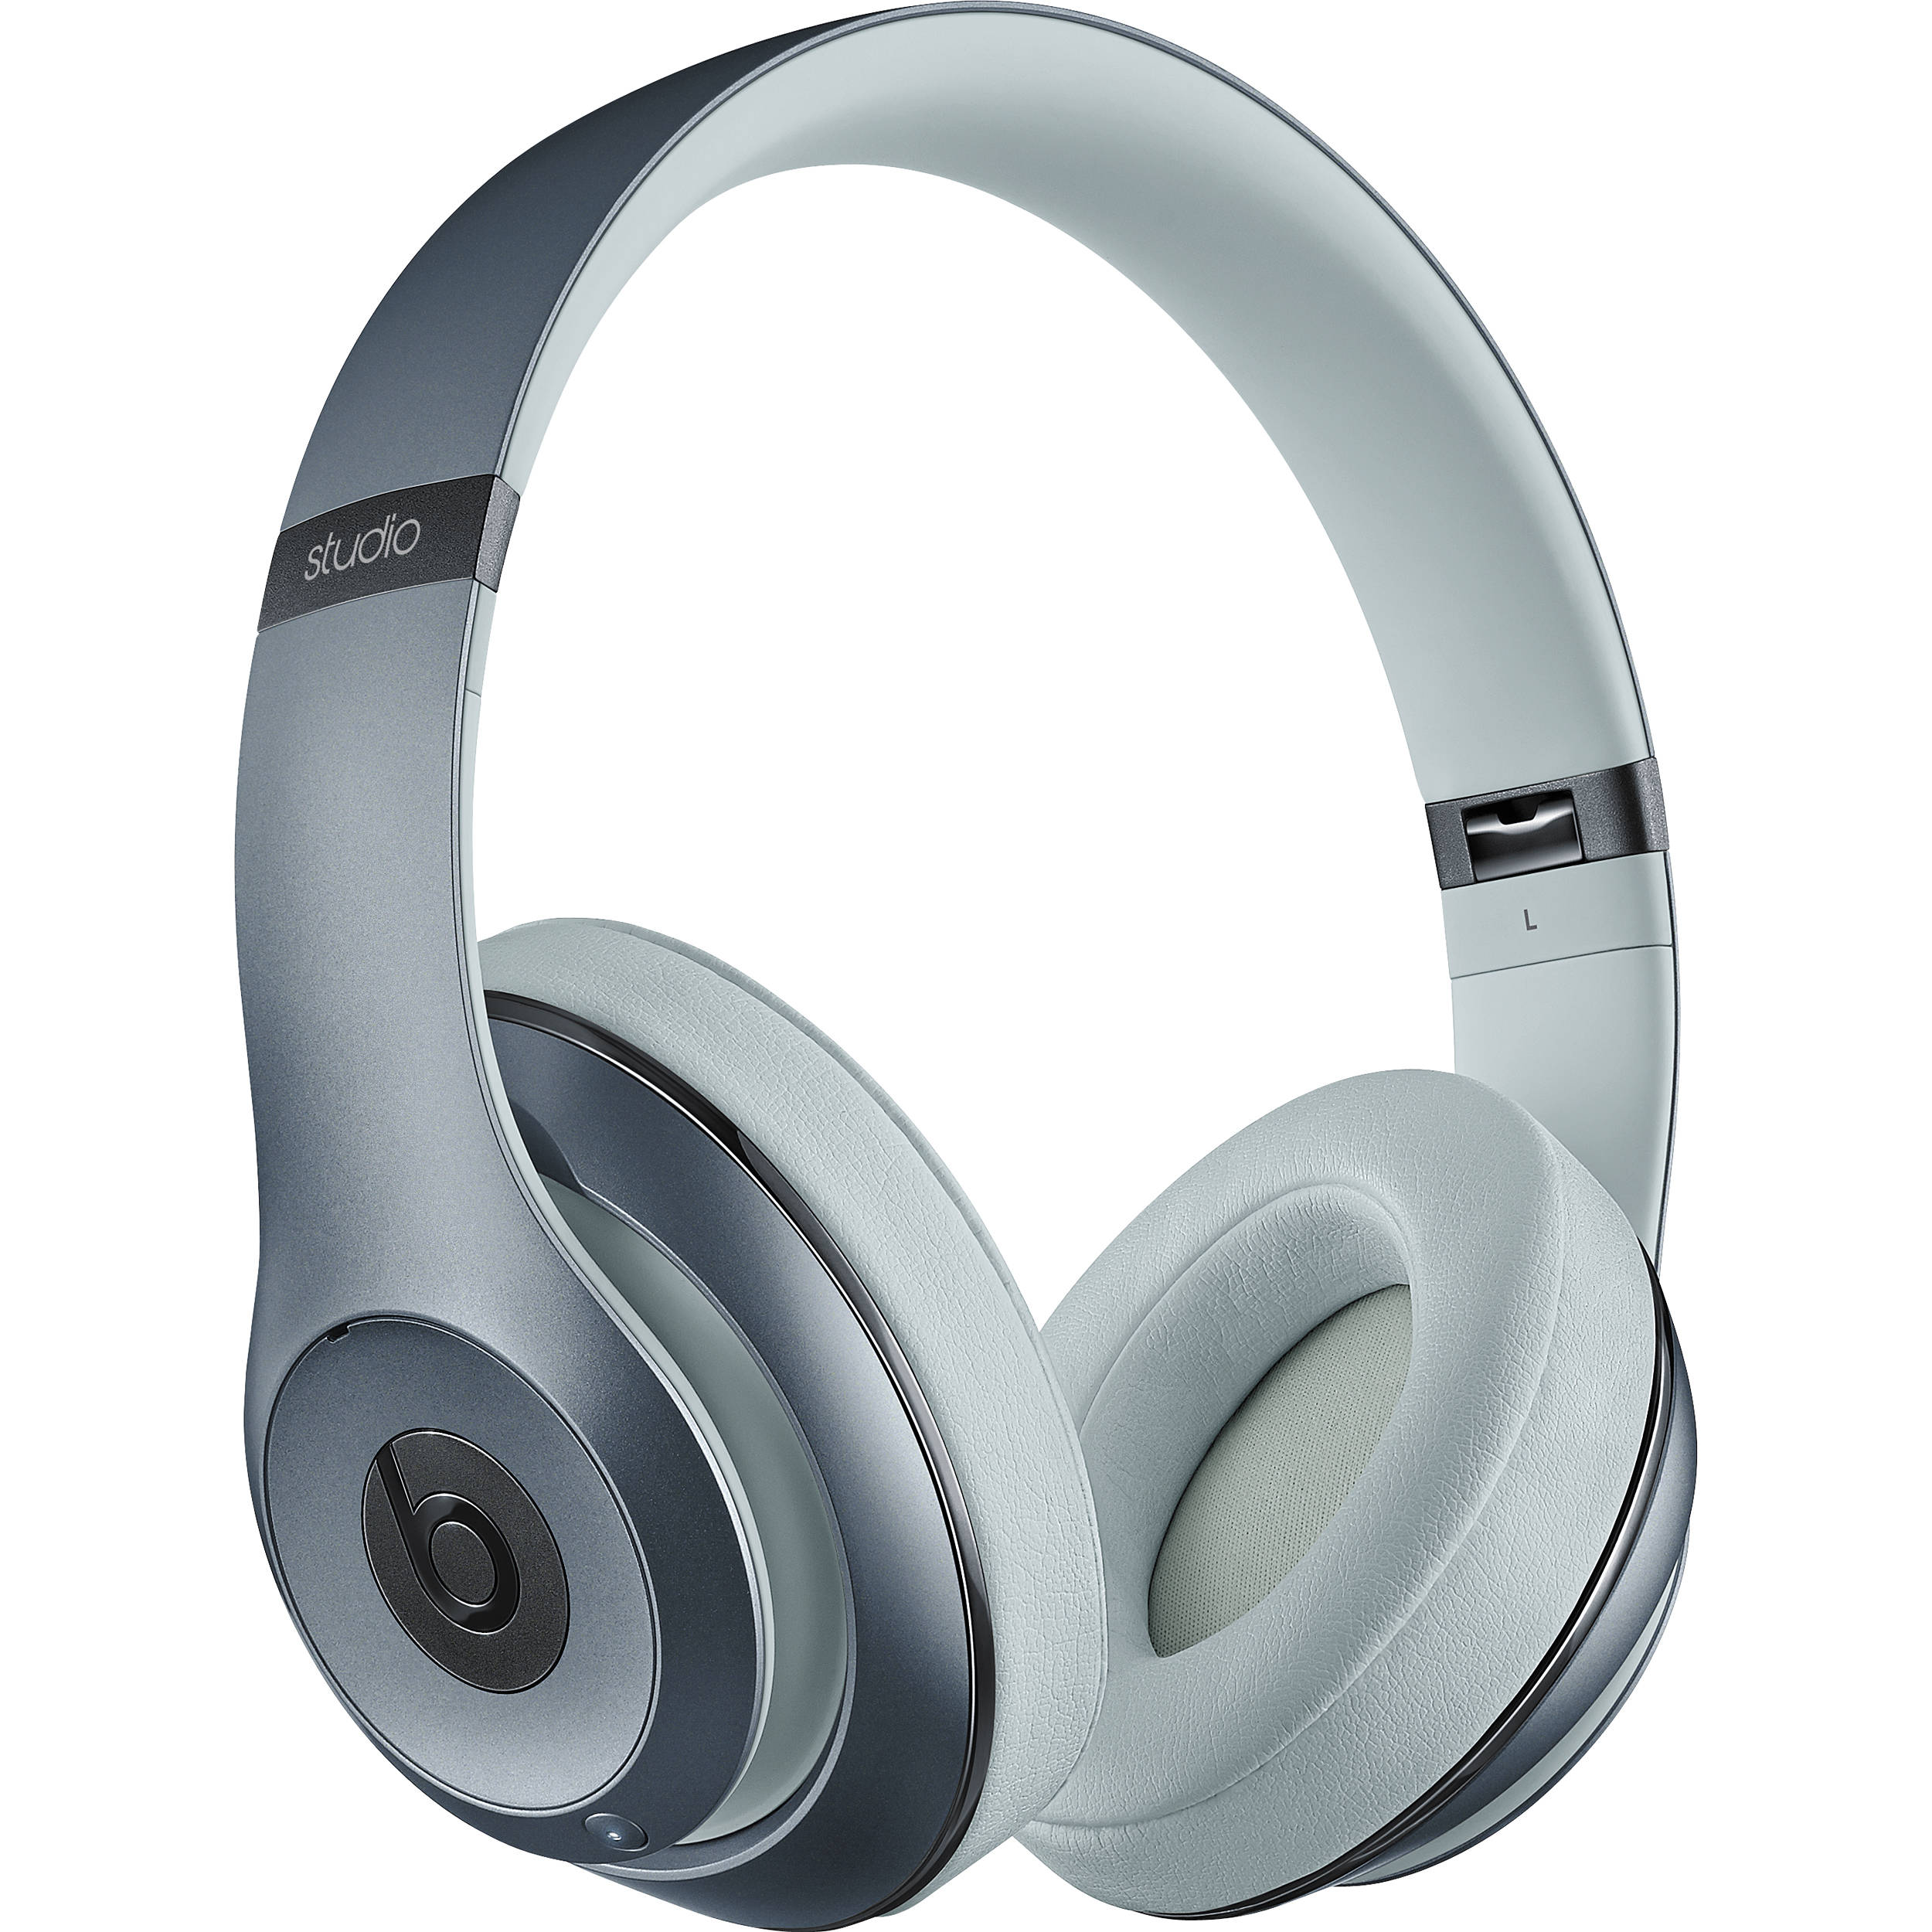 Beats by Dr. Dre Studio2 Wireless Headphones MHDL2AM/A B&H Photo